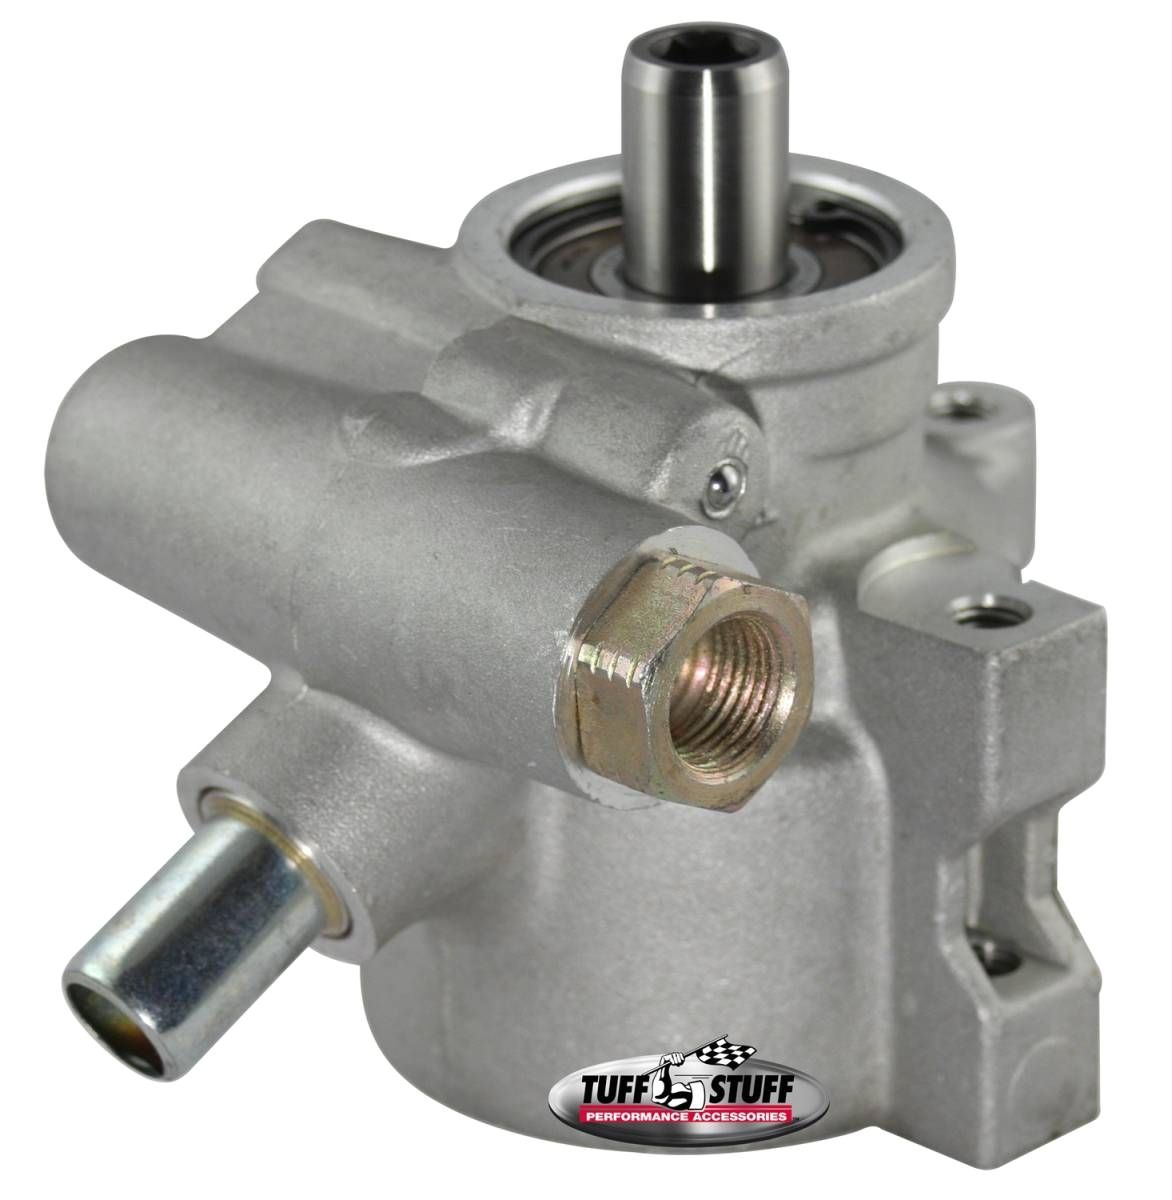 tuff stuff performance type ii alum power steering pump m16 and 5 8